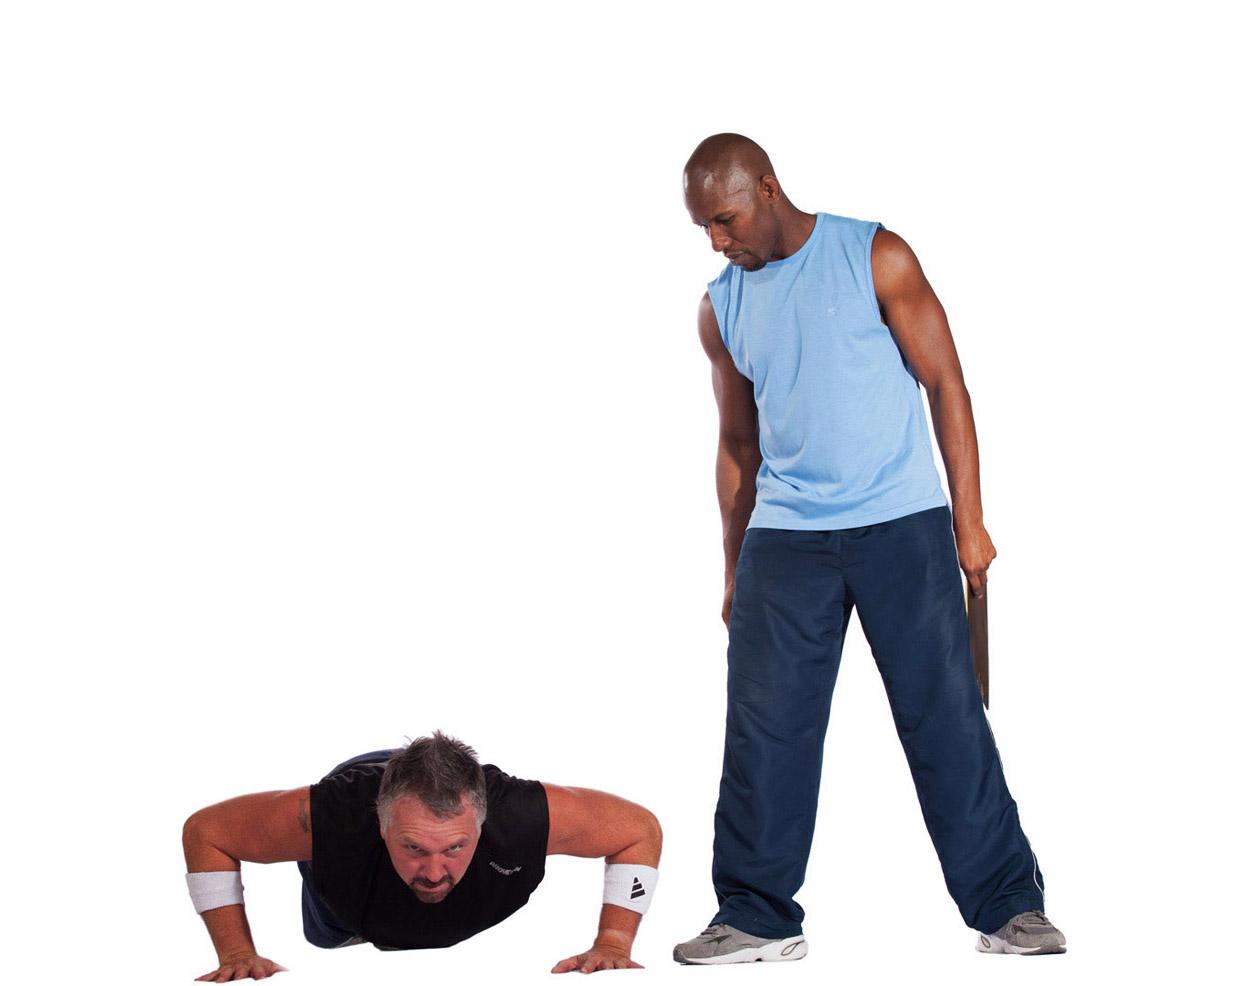 michael-flanagan-personal-trainer-fairbanks-alaska-with-male-client-doing-push-ups-web.jpg